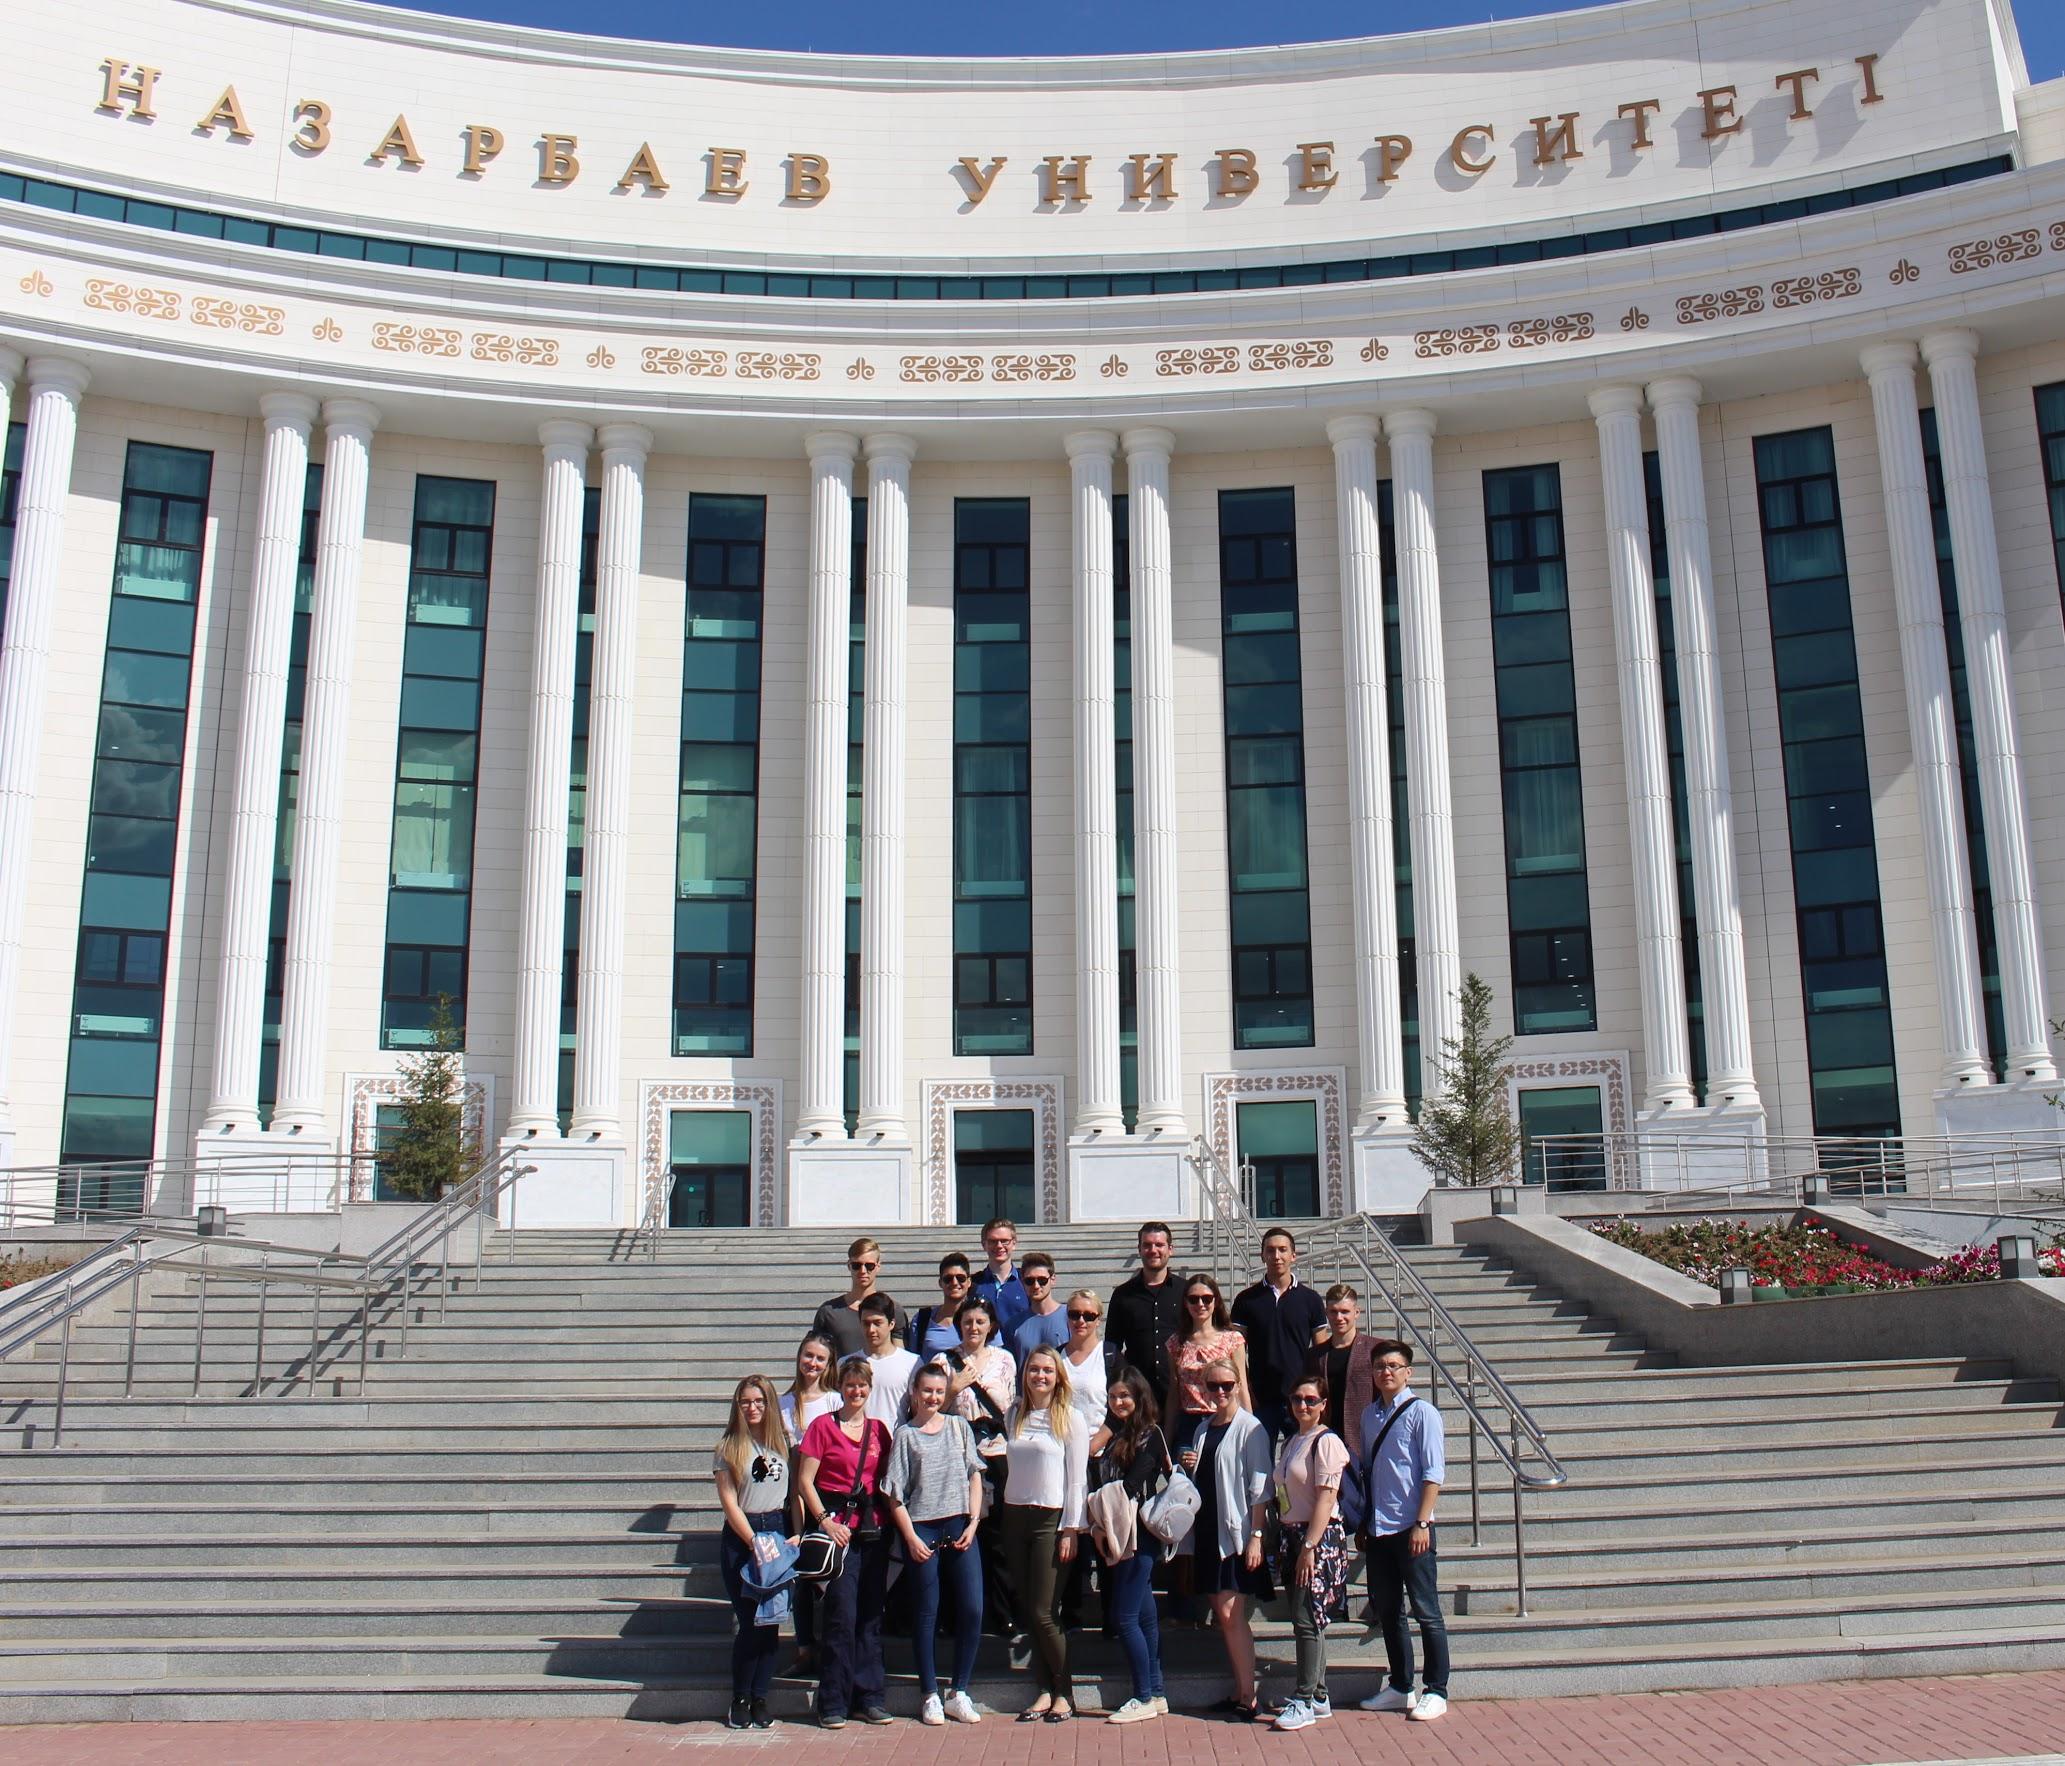 Nasarbajew Universität